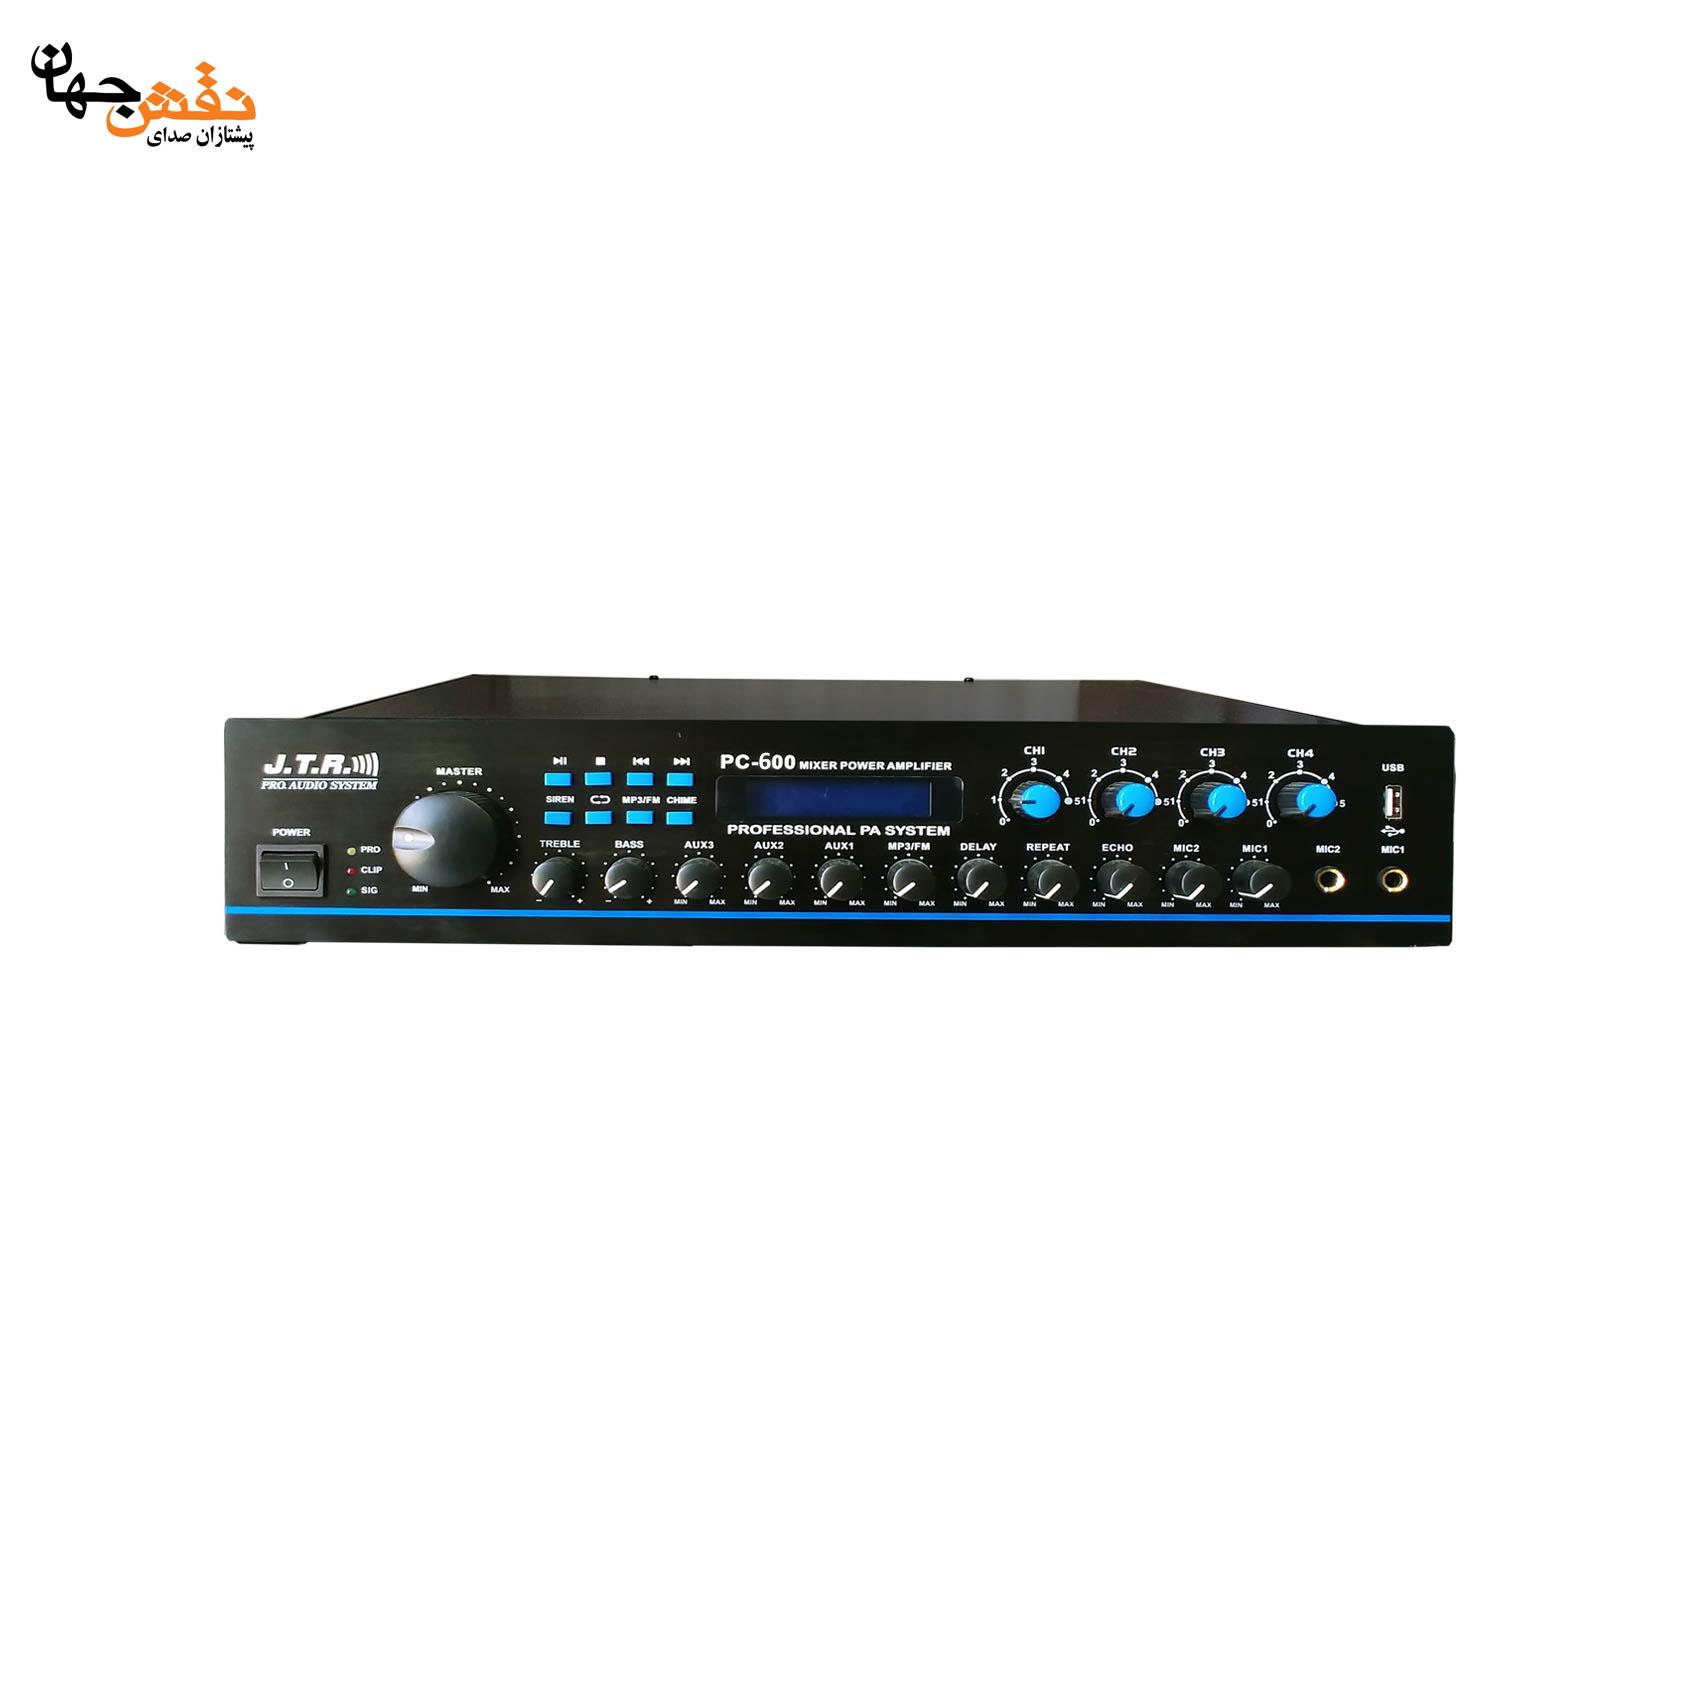 اکو آمپلی فایر جی تی ار مدل PC600 | JTR PC600 Public Address Amplifier